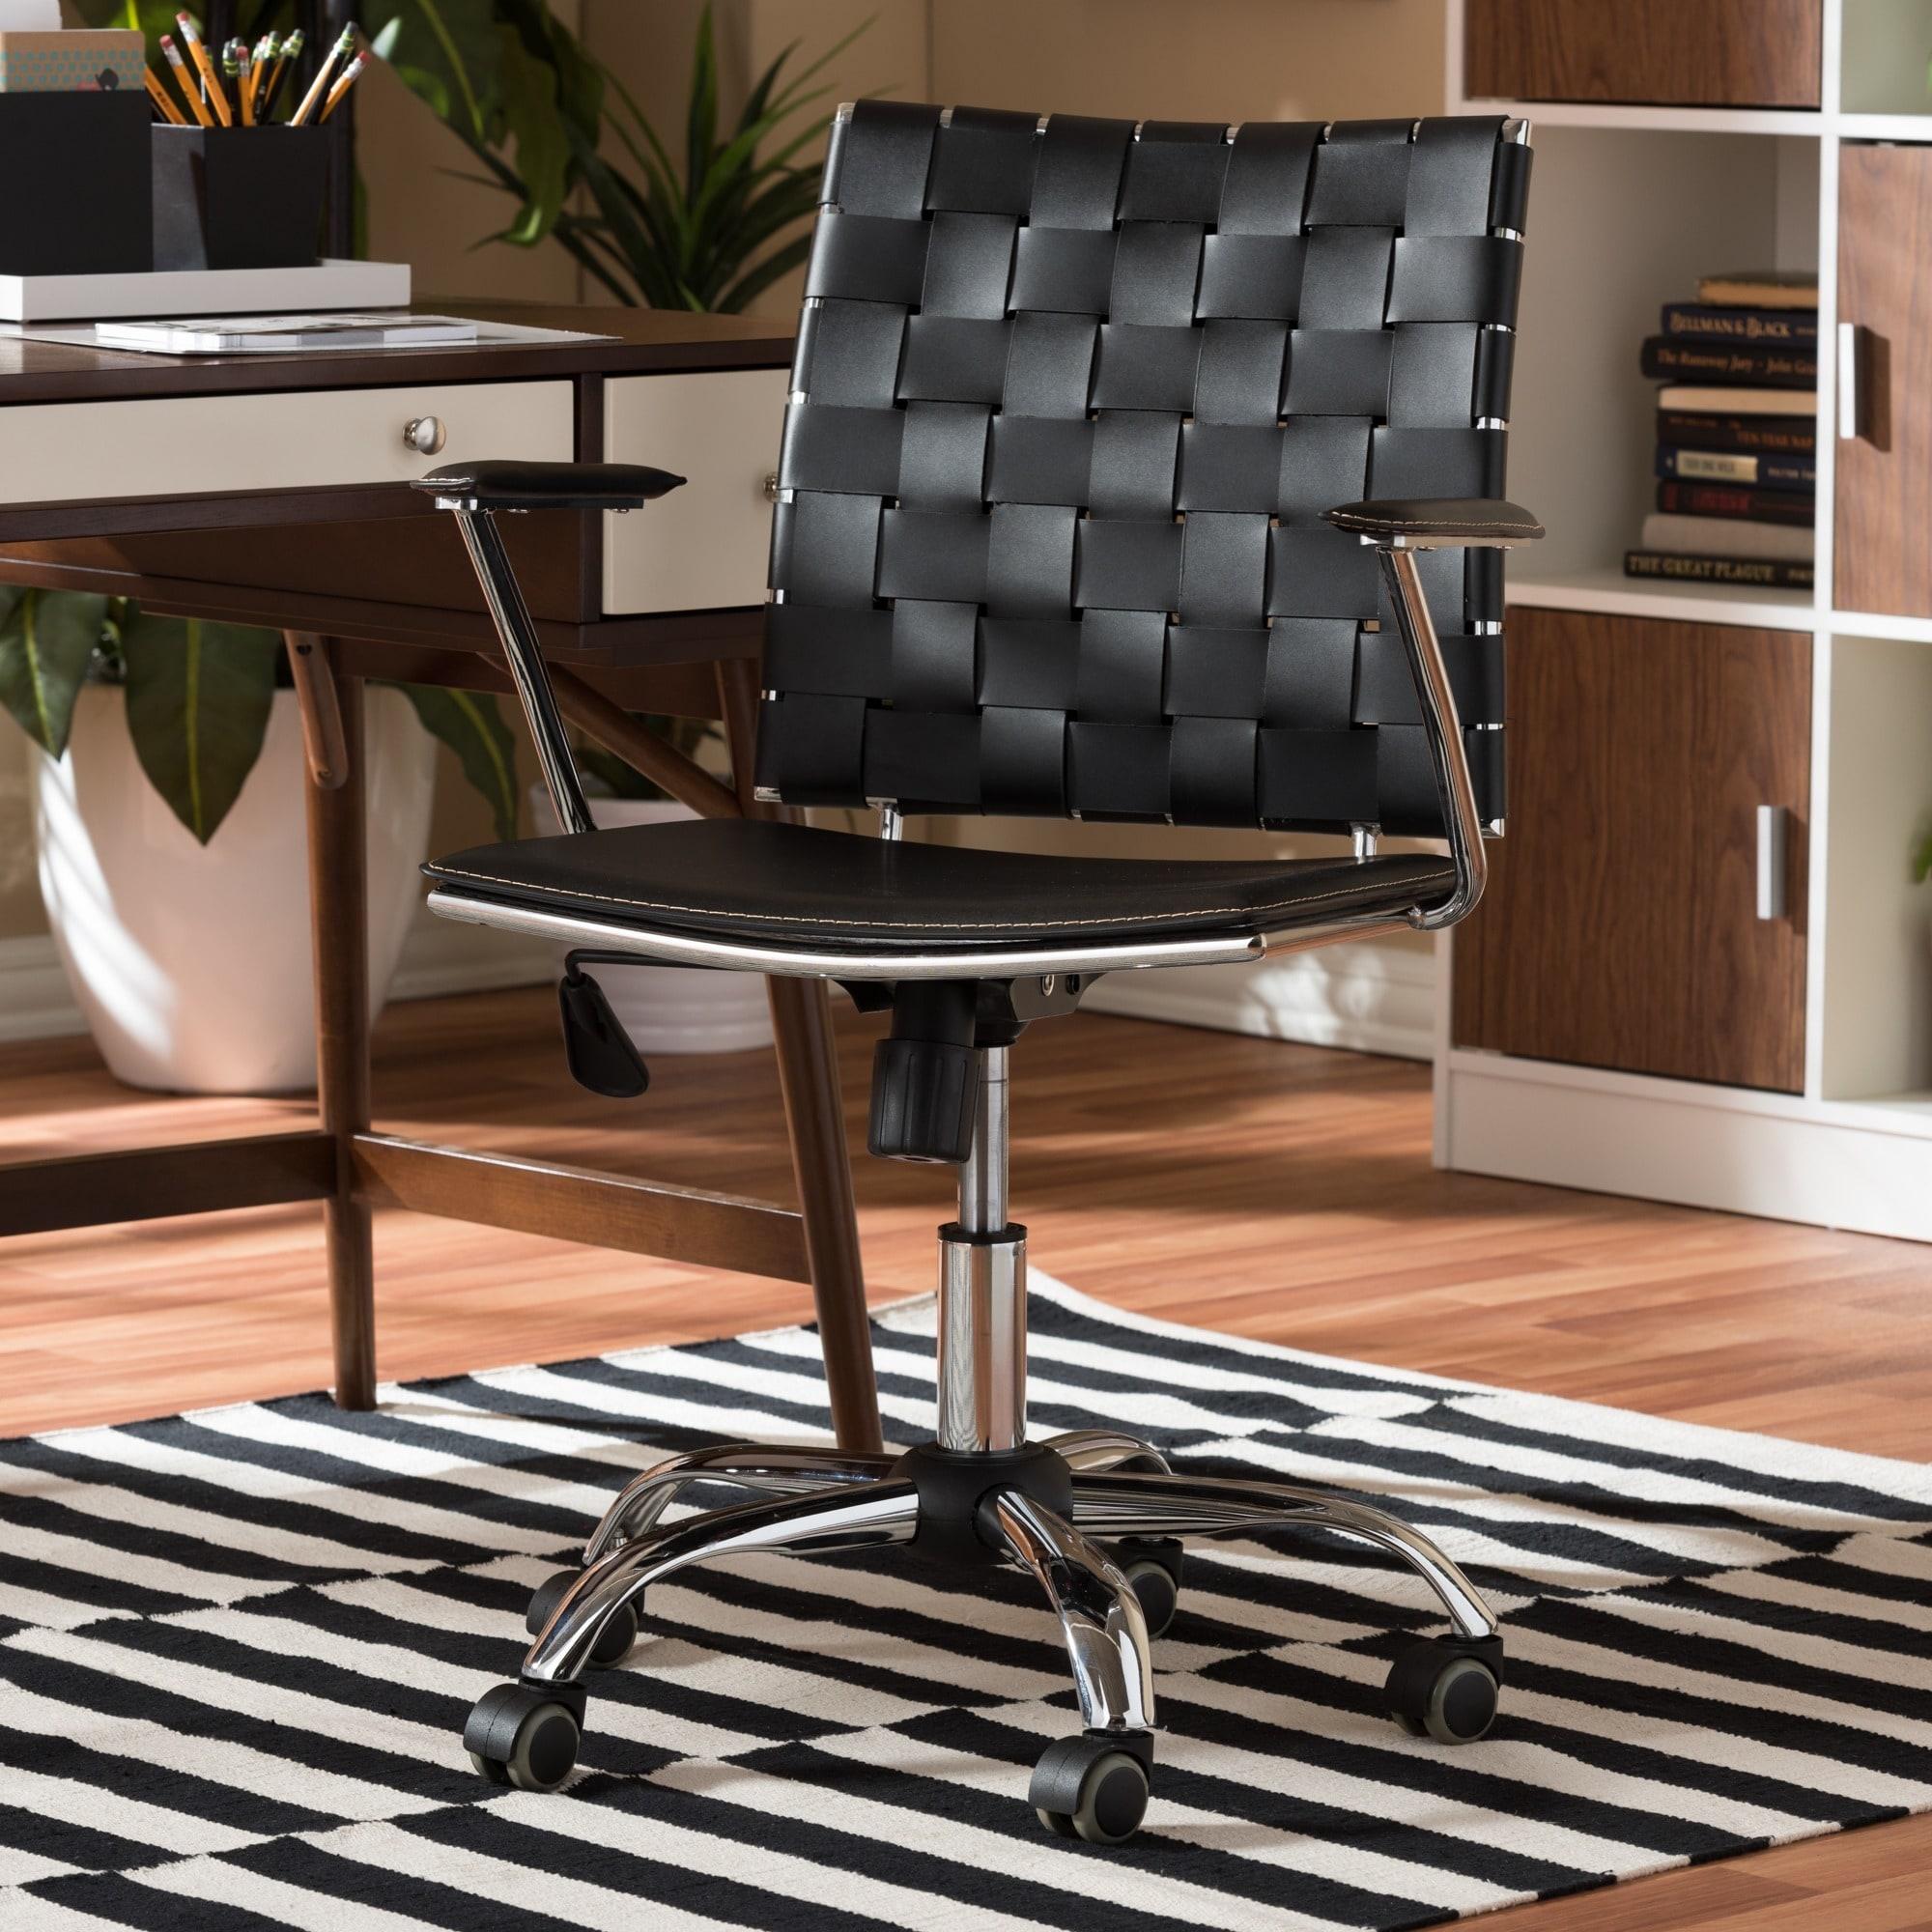 Sensational Baxton Studio Vittoria Black Leather Modern Office Chair Home Interior And Landscaping Palasignezvosmurscom